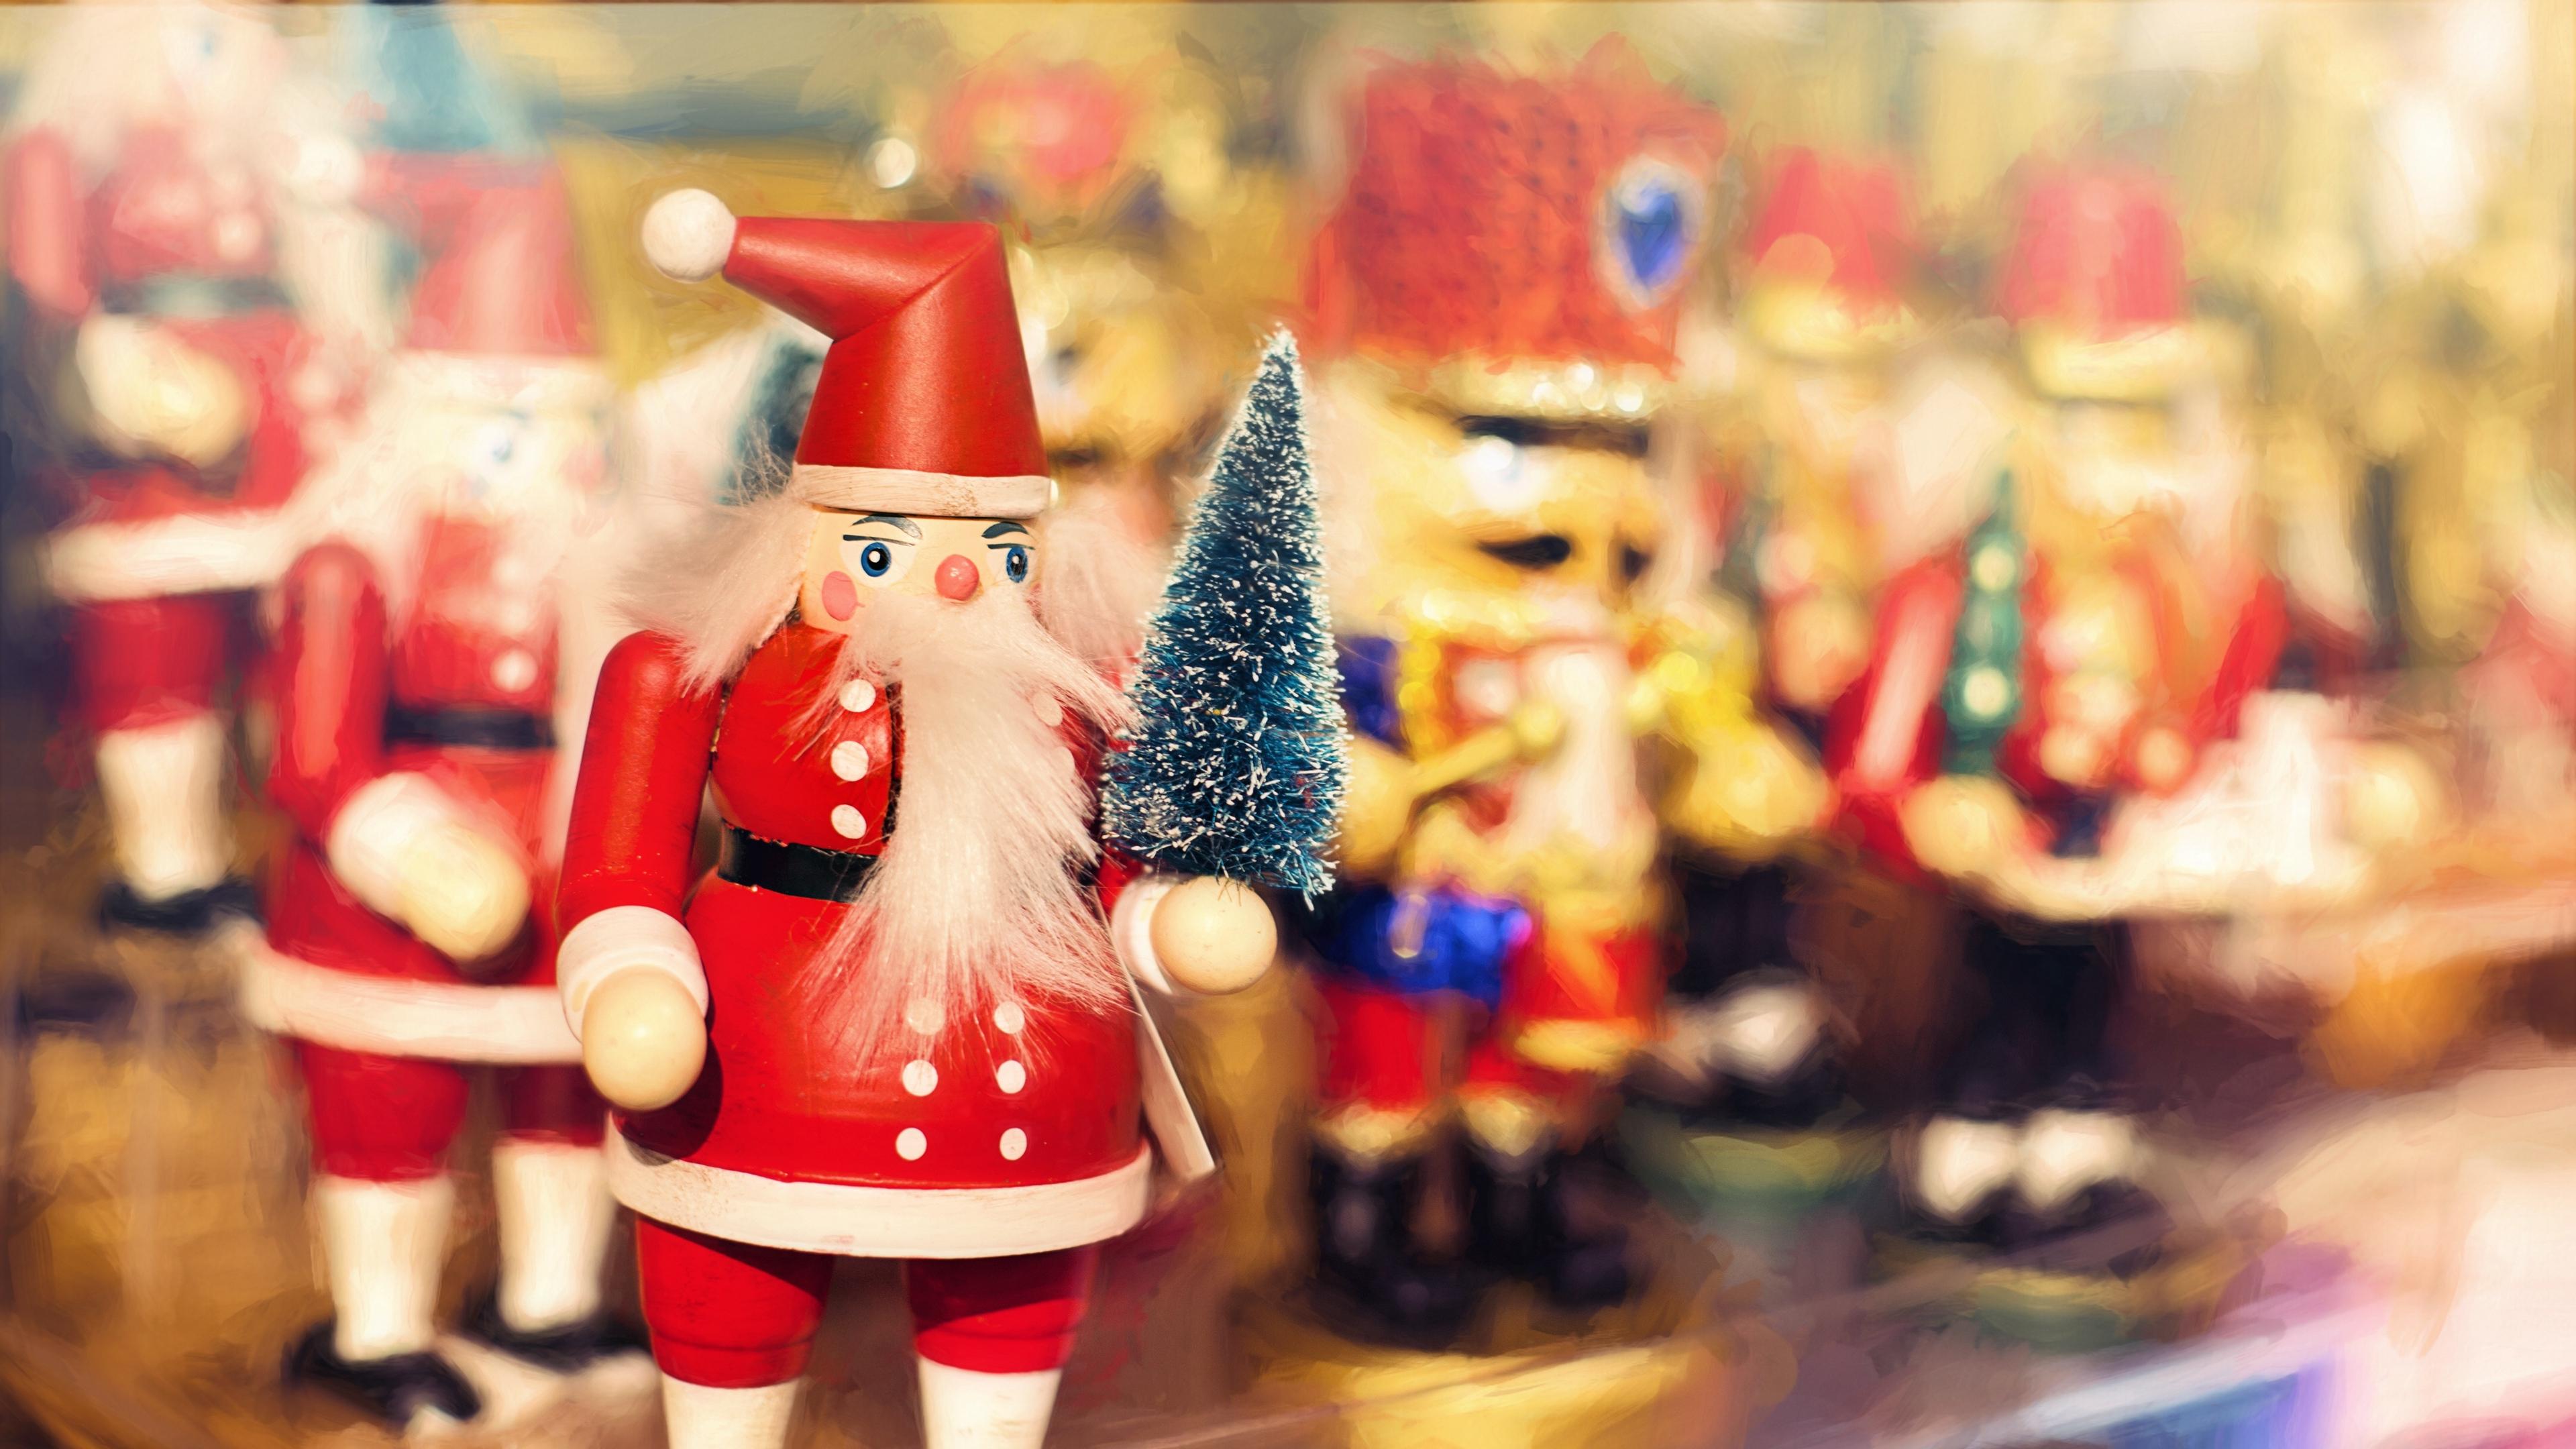 christmas santa claus new year 4k 1538345186 - christmas, santa claus, new year 4k - santa claus, new year, Christmas